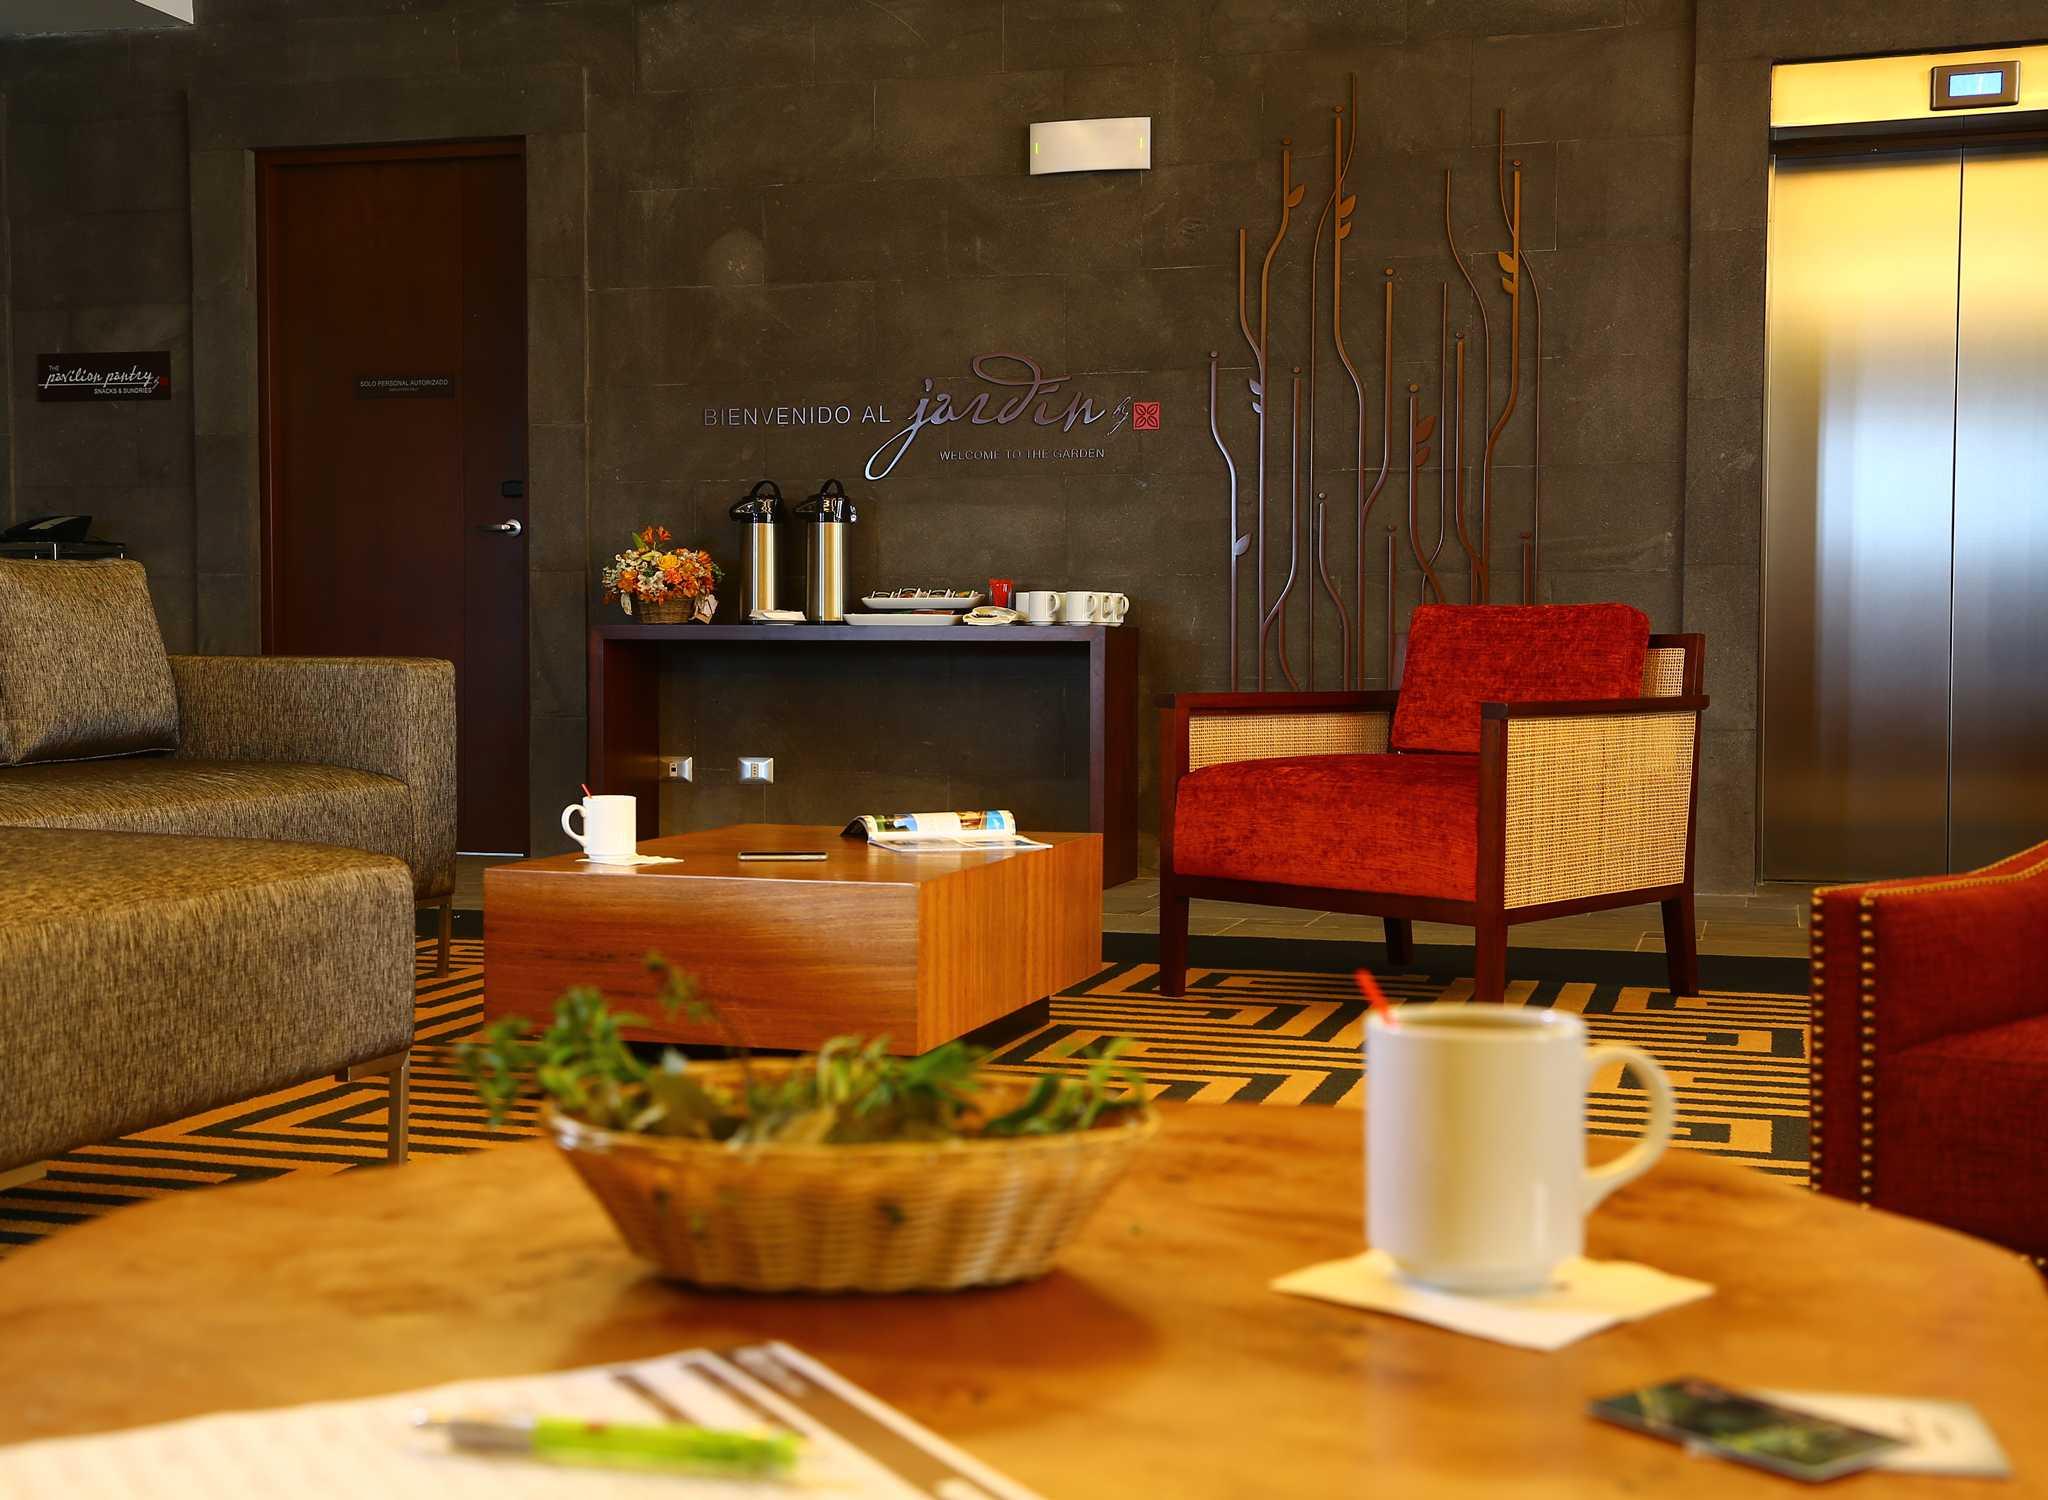 Hilton Hotels & Resorts - Peru